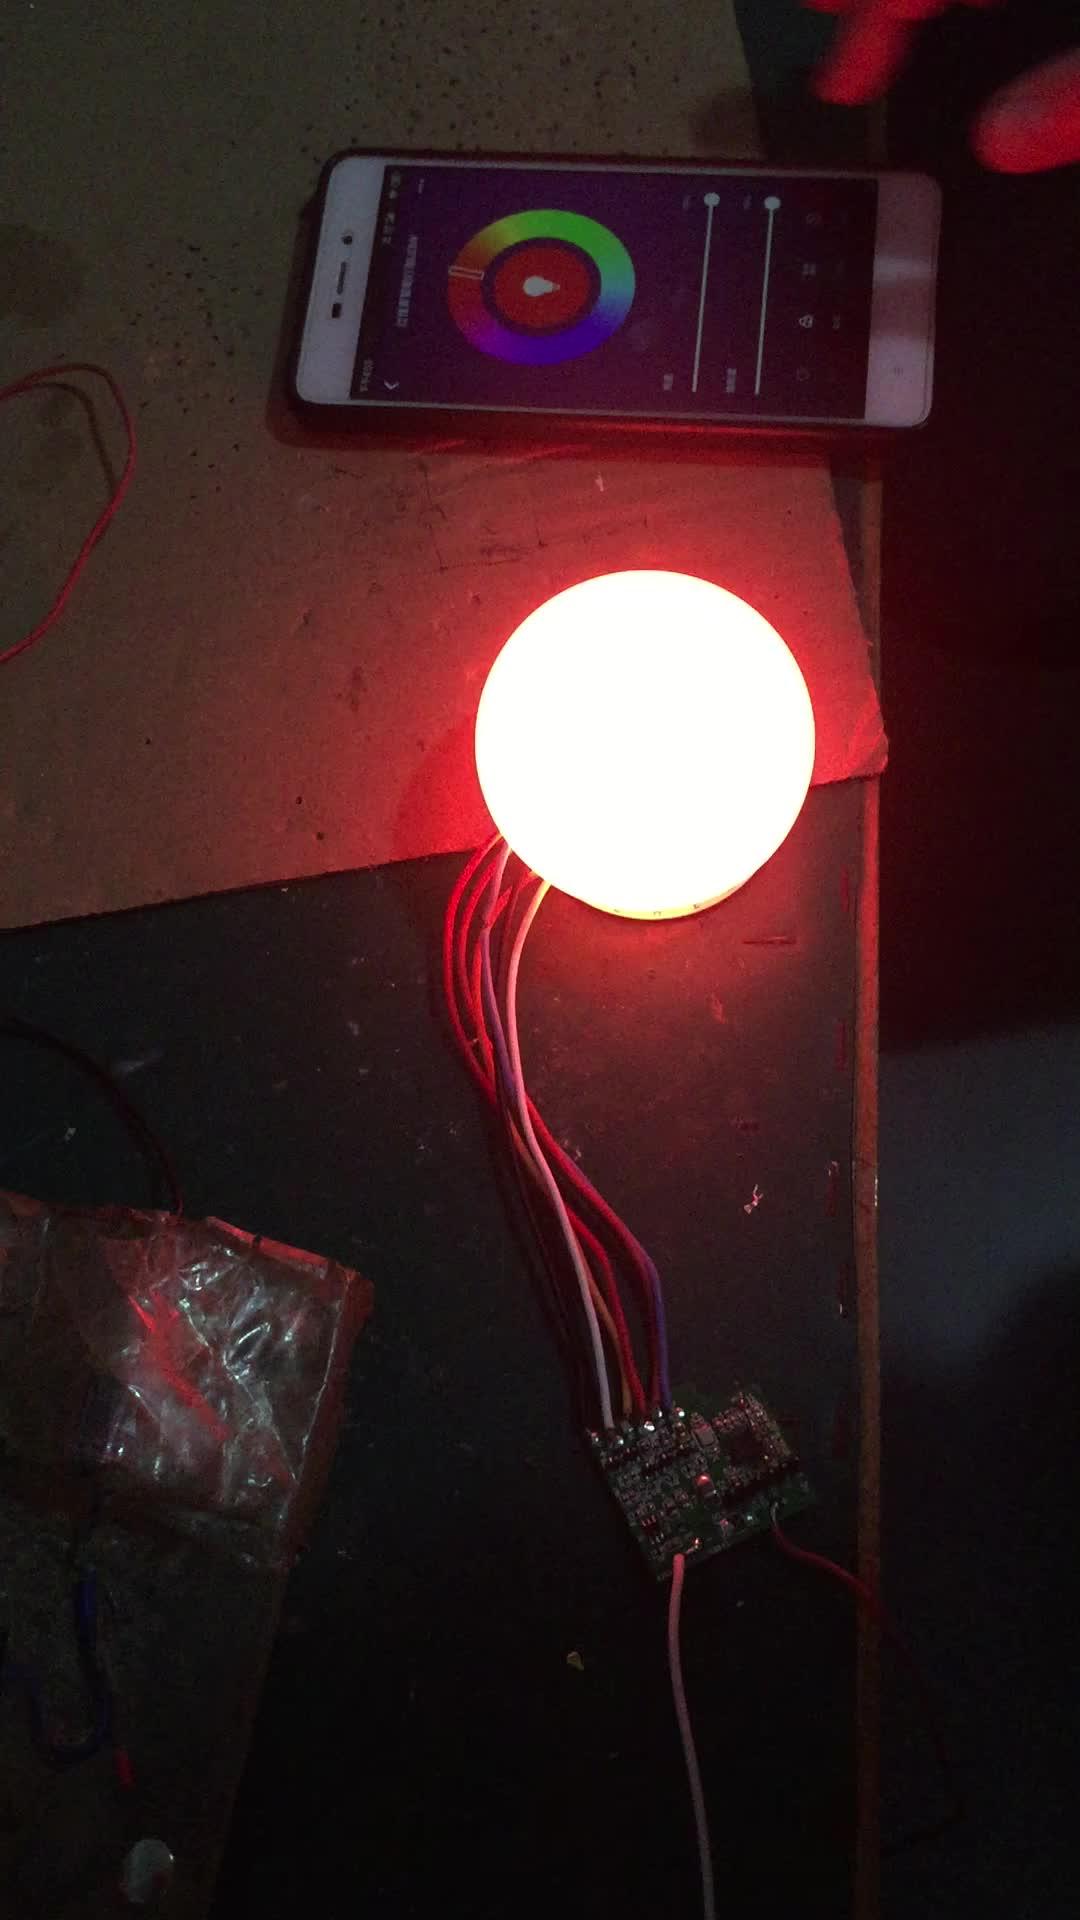 Alexa Domotica IOS Android Apparaten 7W 9W Wifi Smart Lamp Kleur Veranderende Led Licht E27 Afstandsbediening draadloze Rgbw Lamp